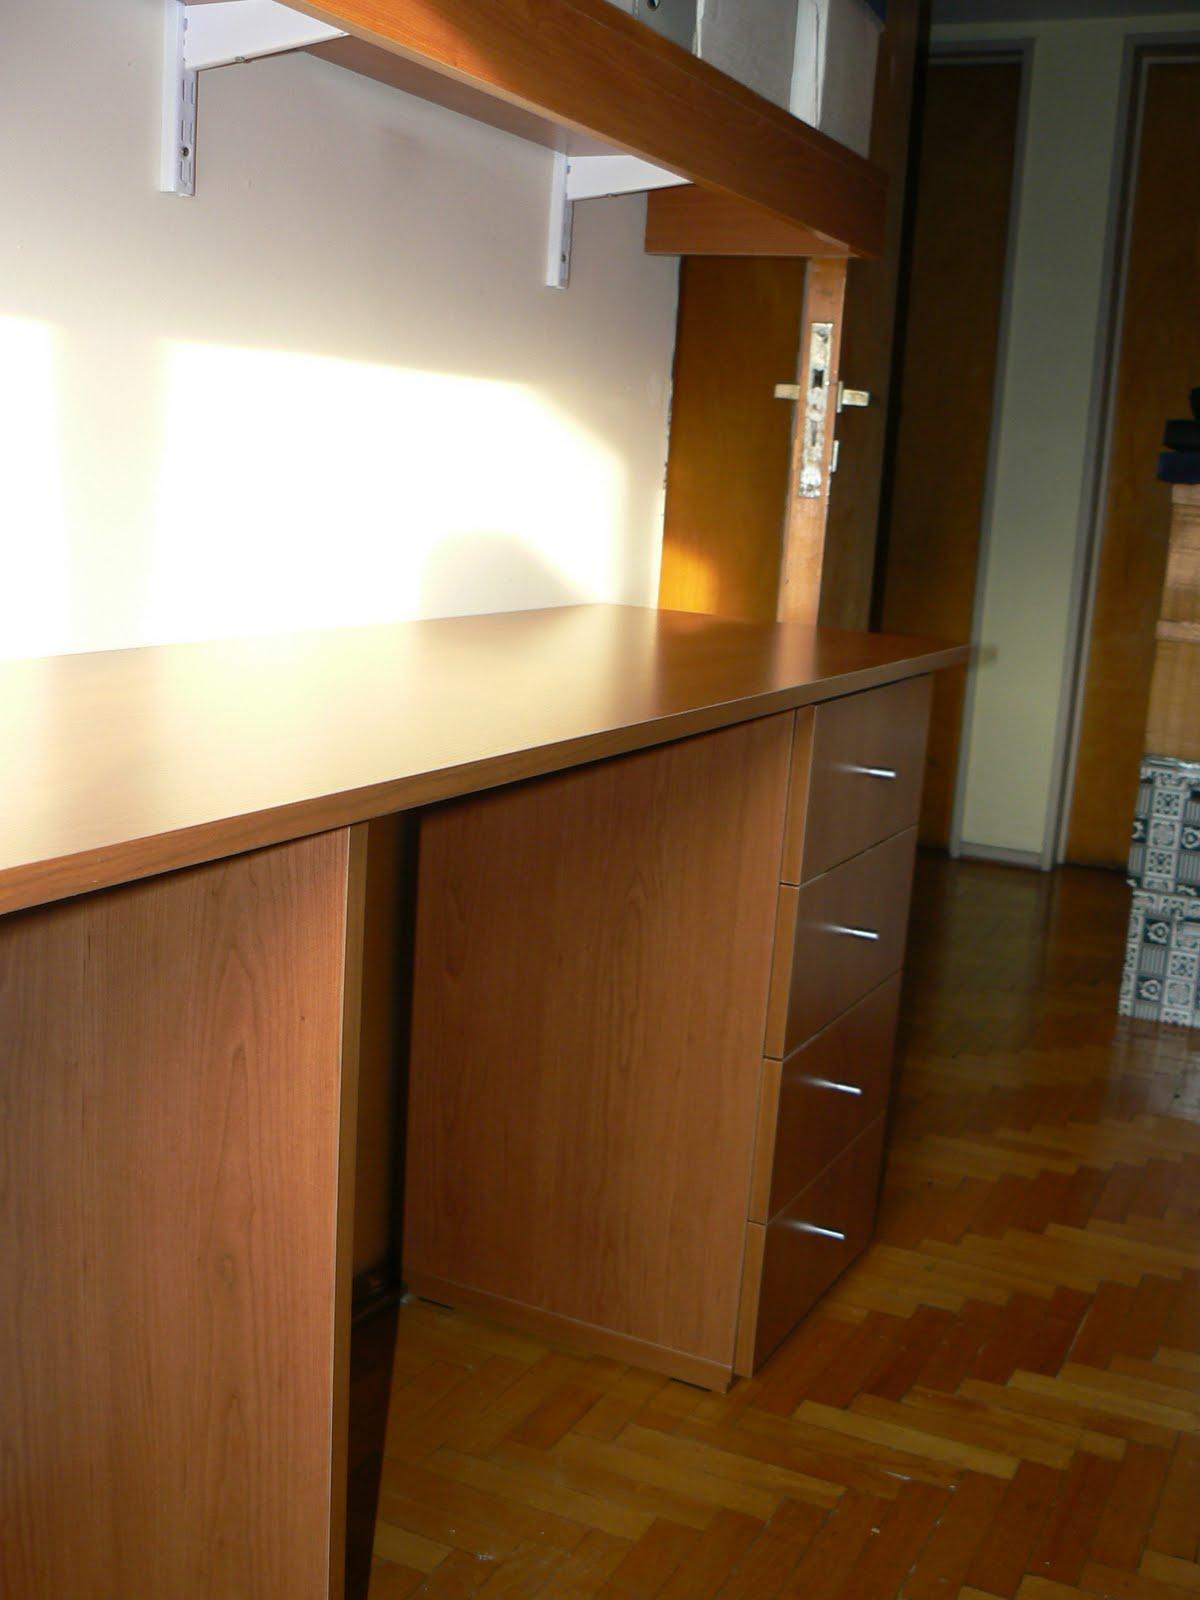 Zavasmuebles carpinteria de dise o escritorio en melamina con cajonera - Cubre escritorio ...